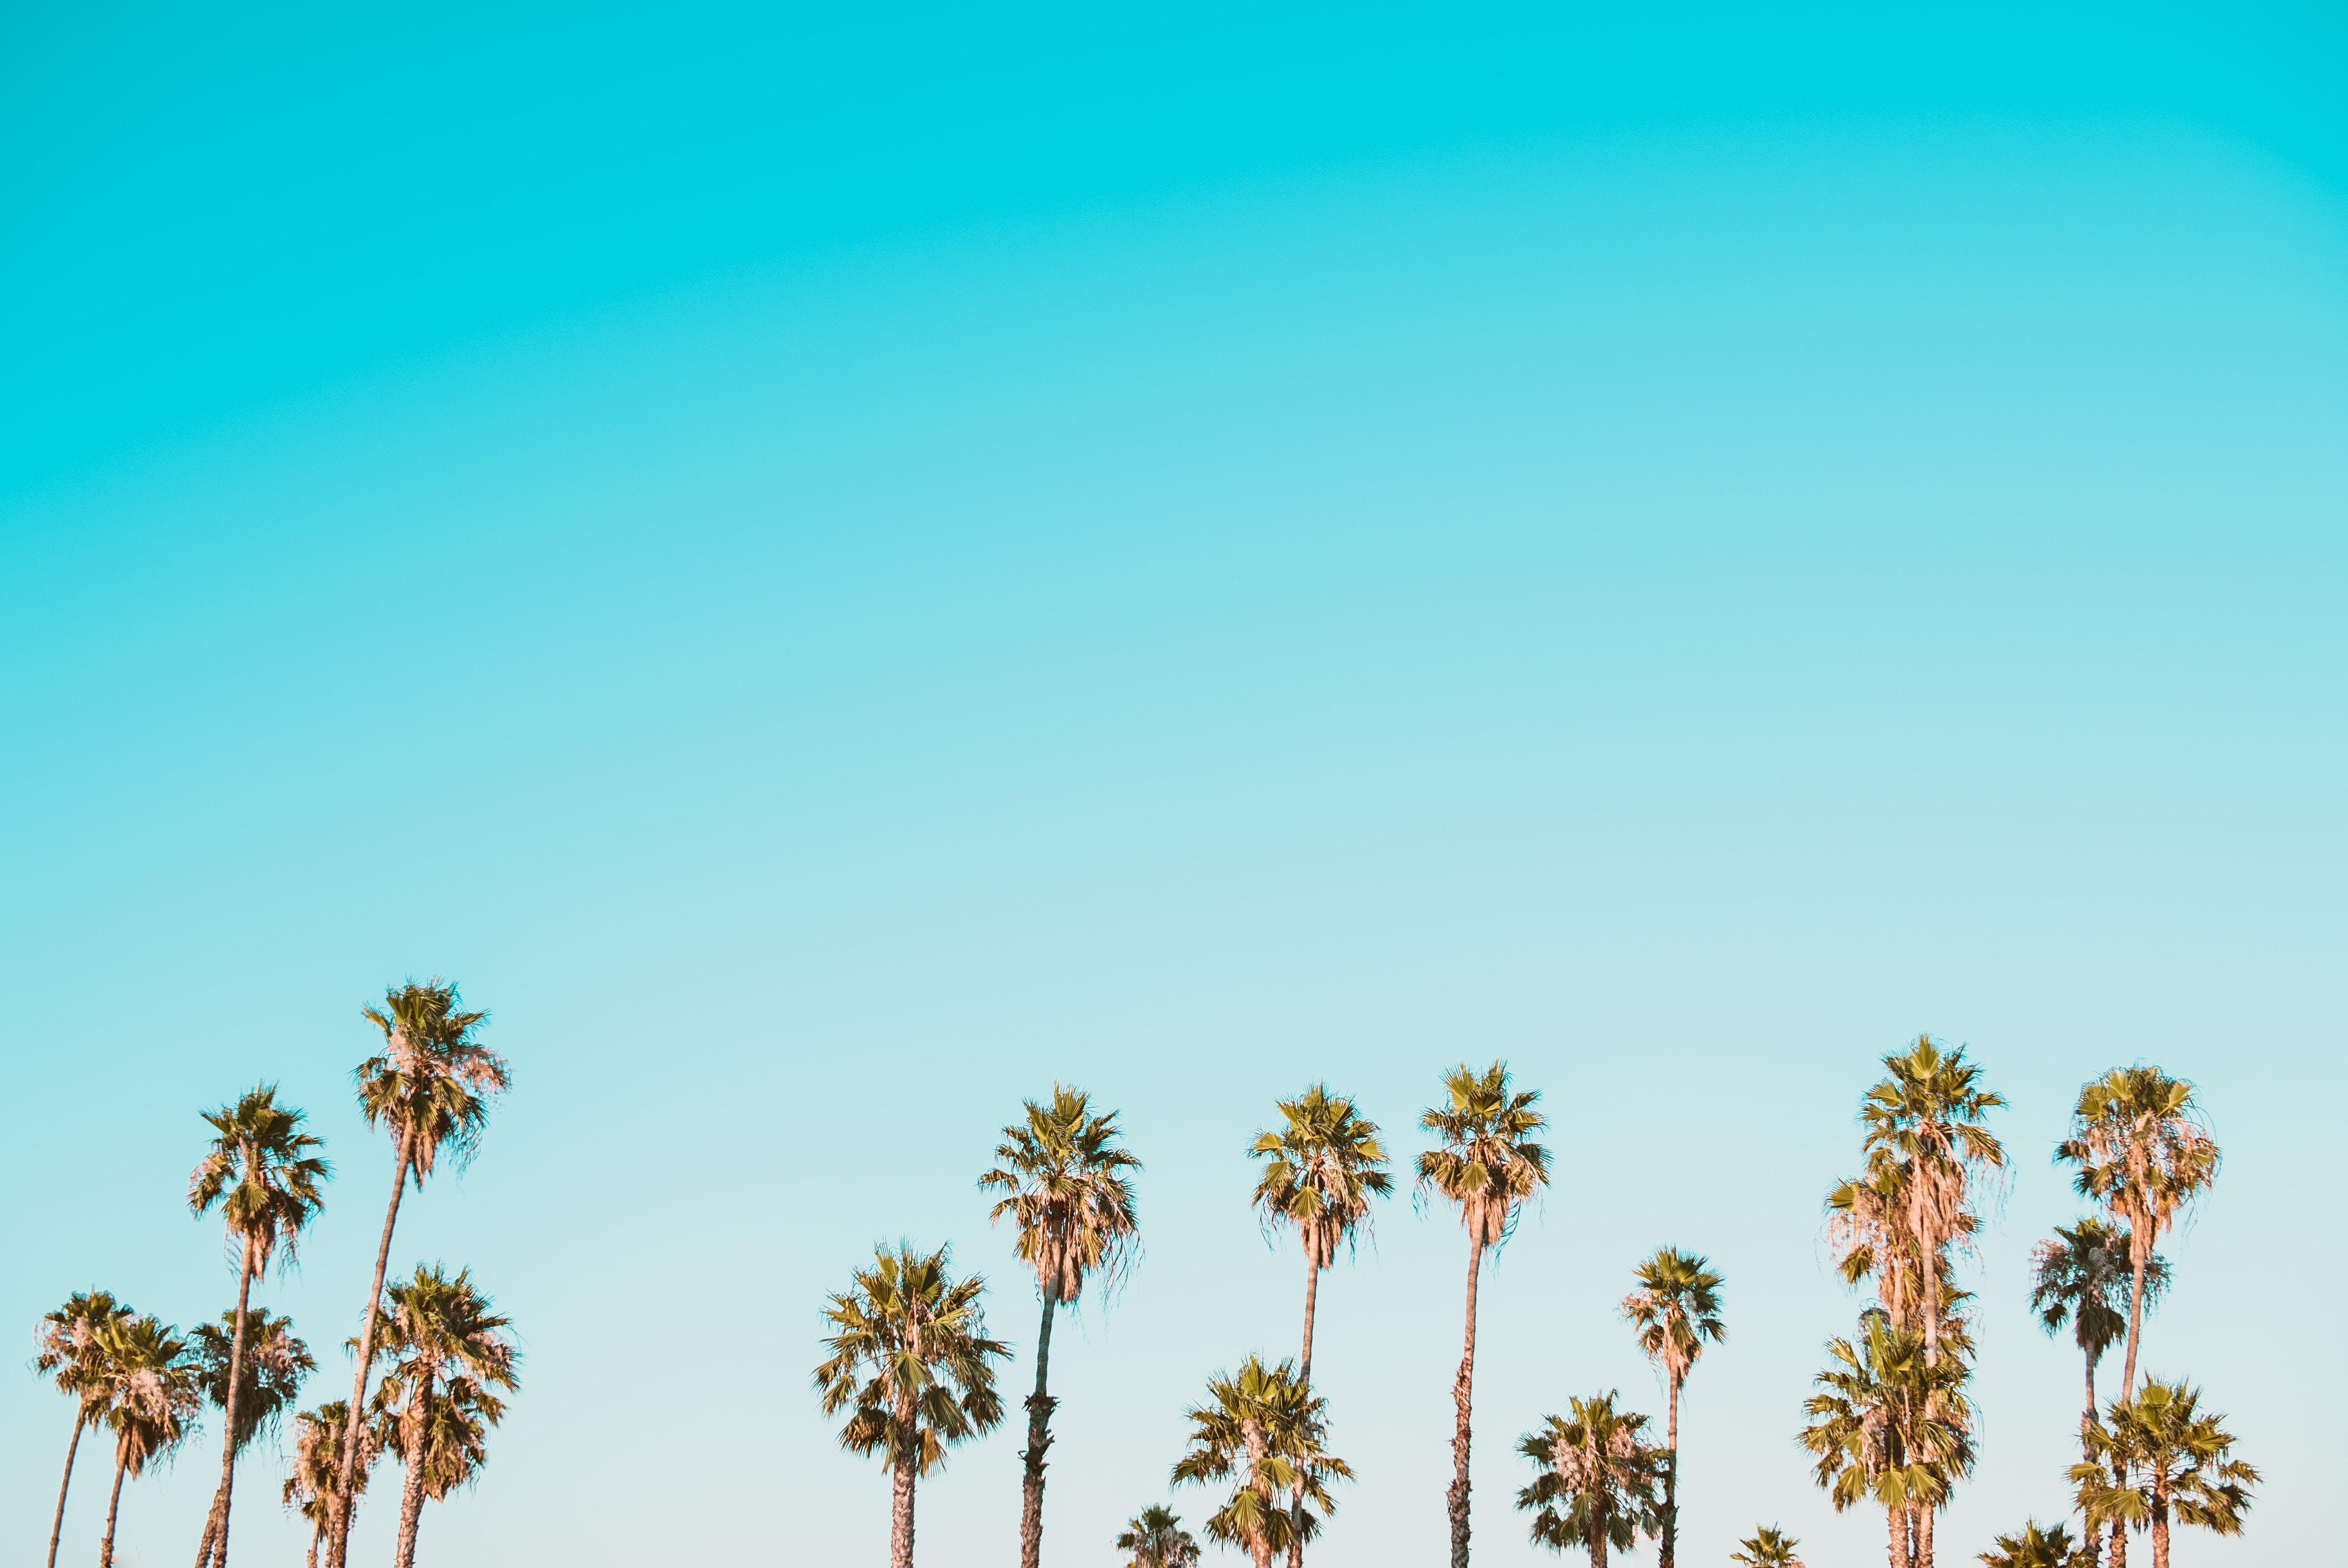 Cute Pineapple Iphone Wallpaper Download Summer Wallpapers Unsplash